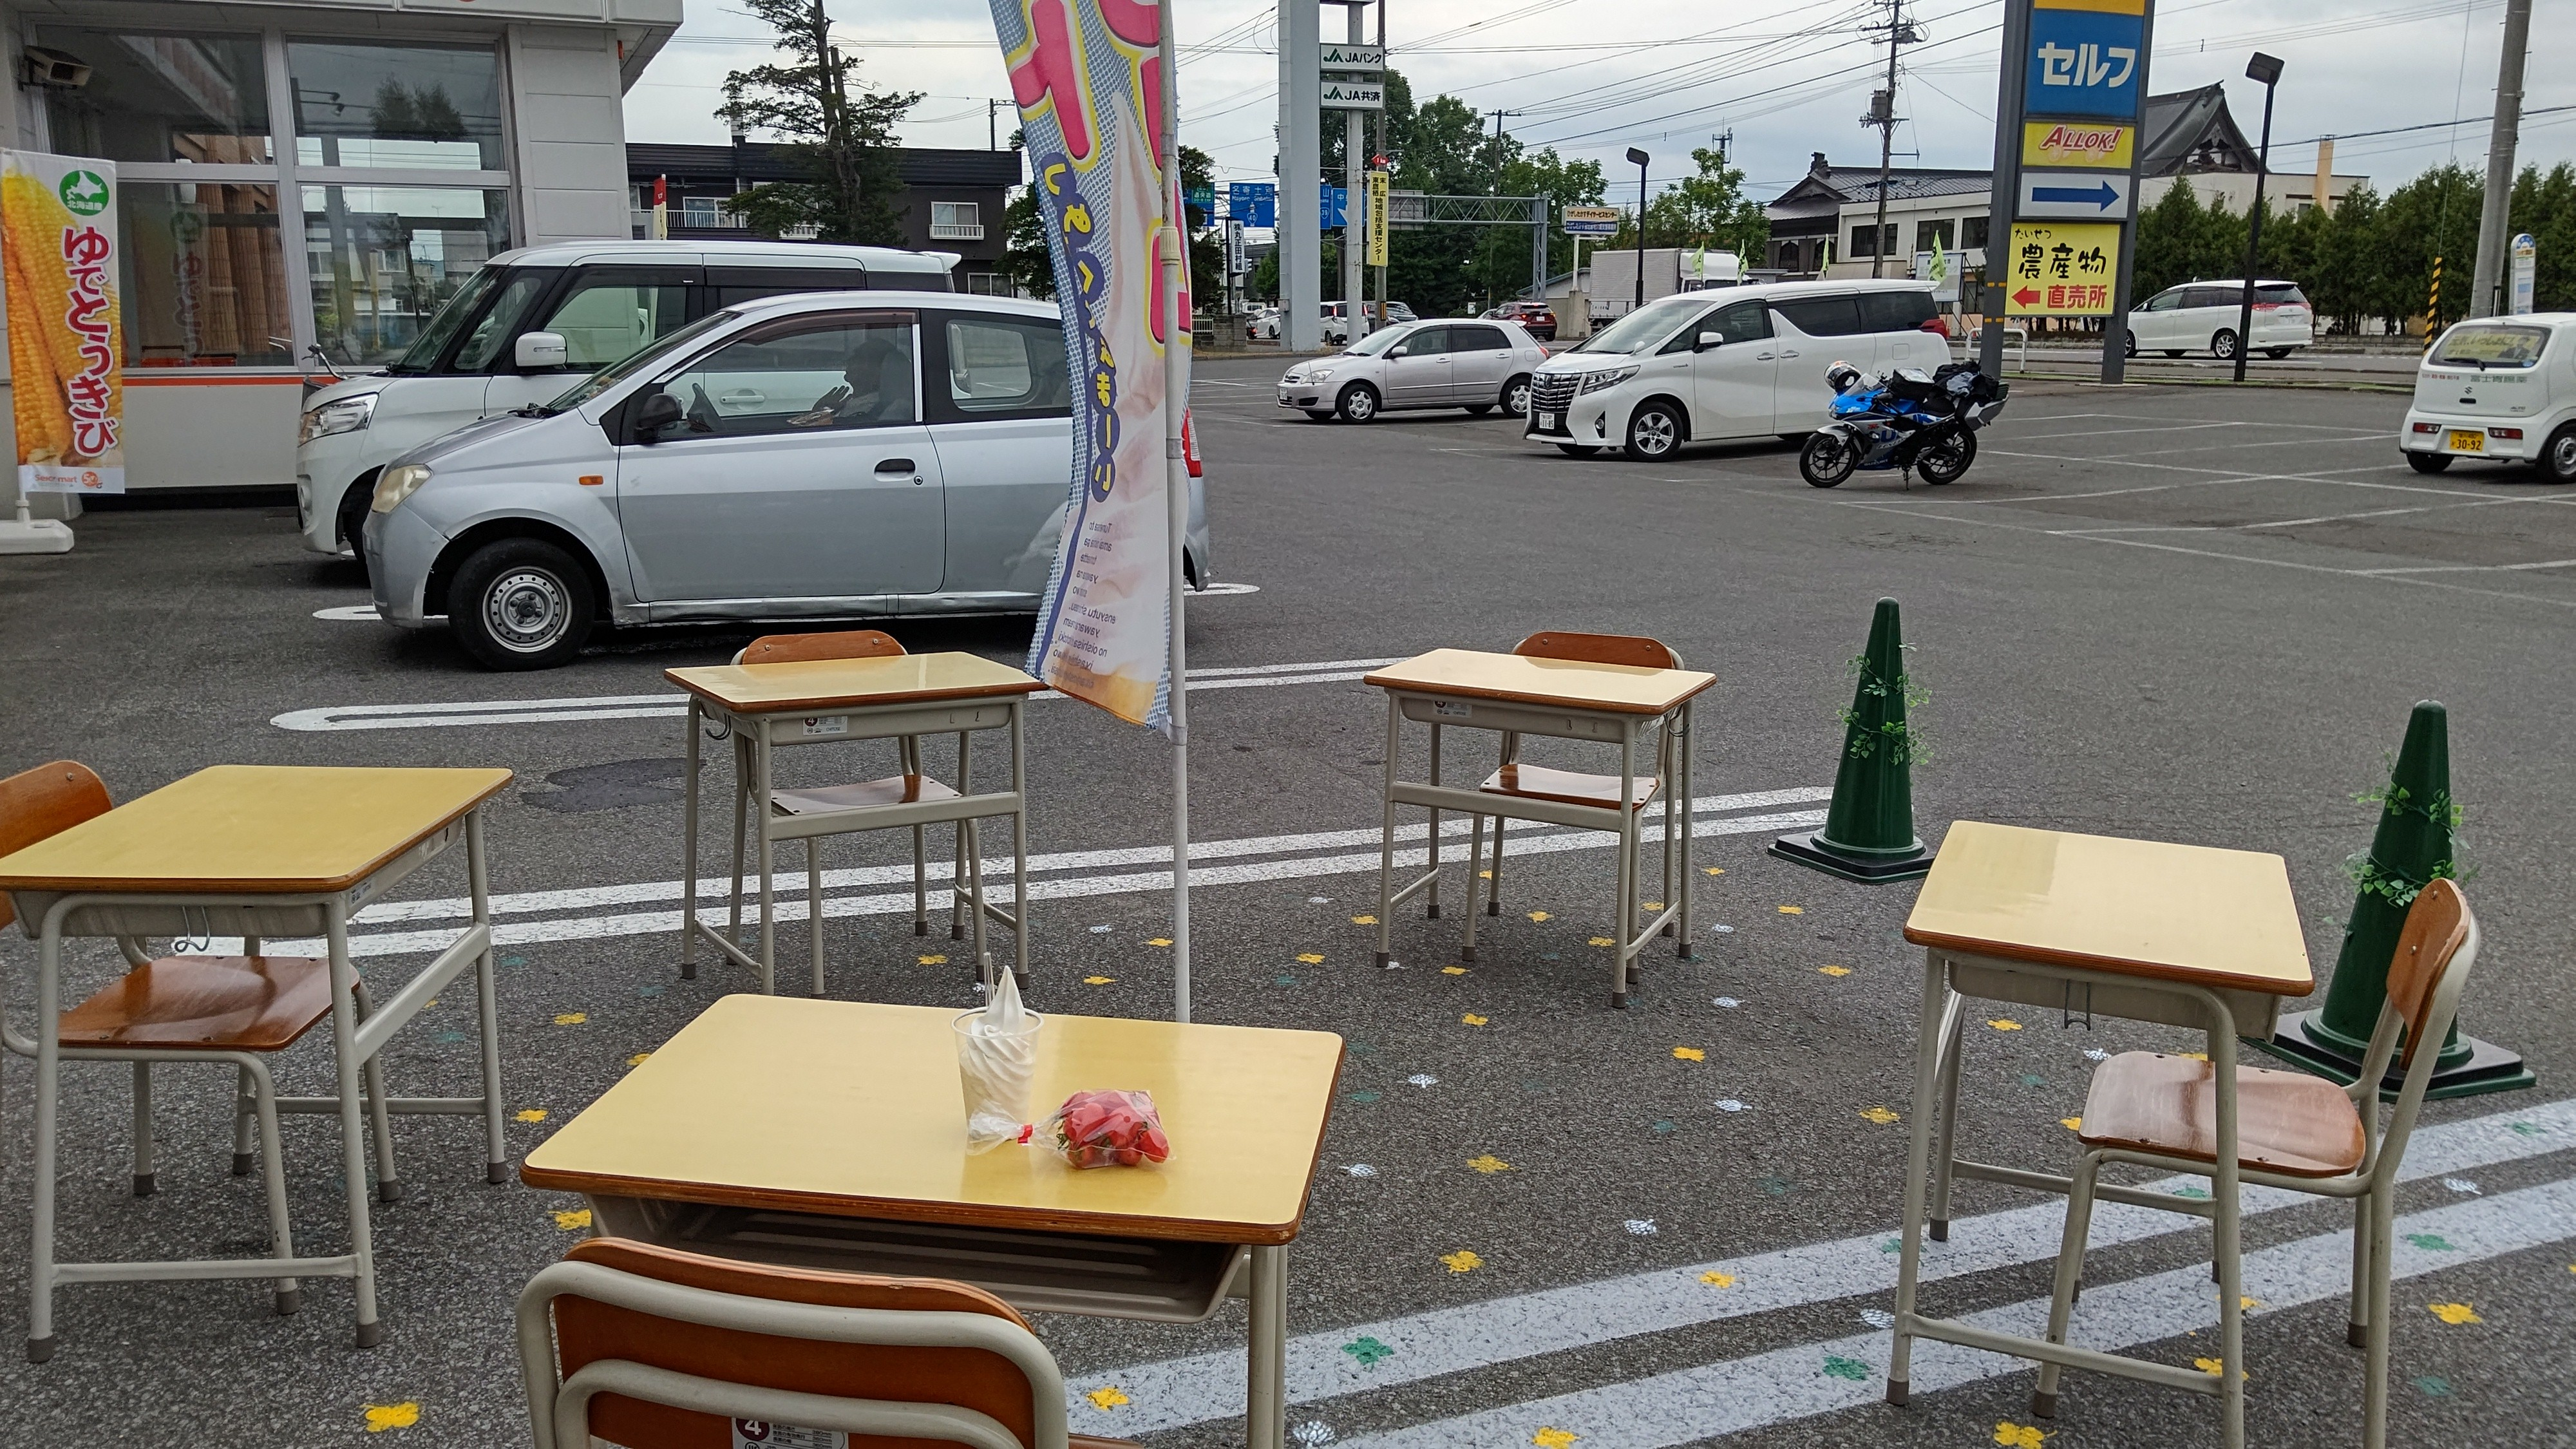 f:id:Tsubasaba:20210819070020j:image